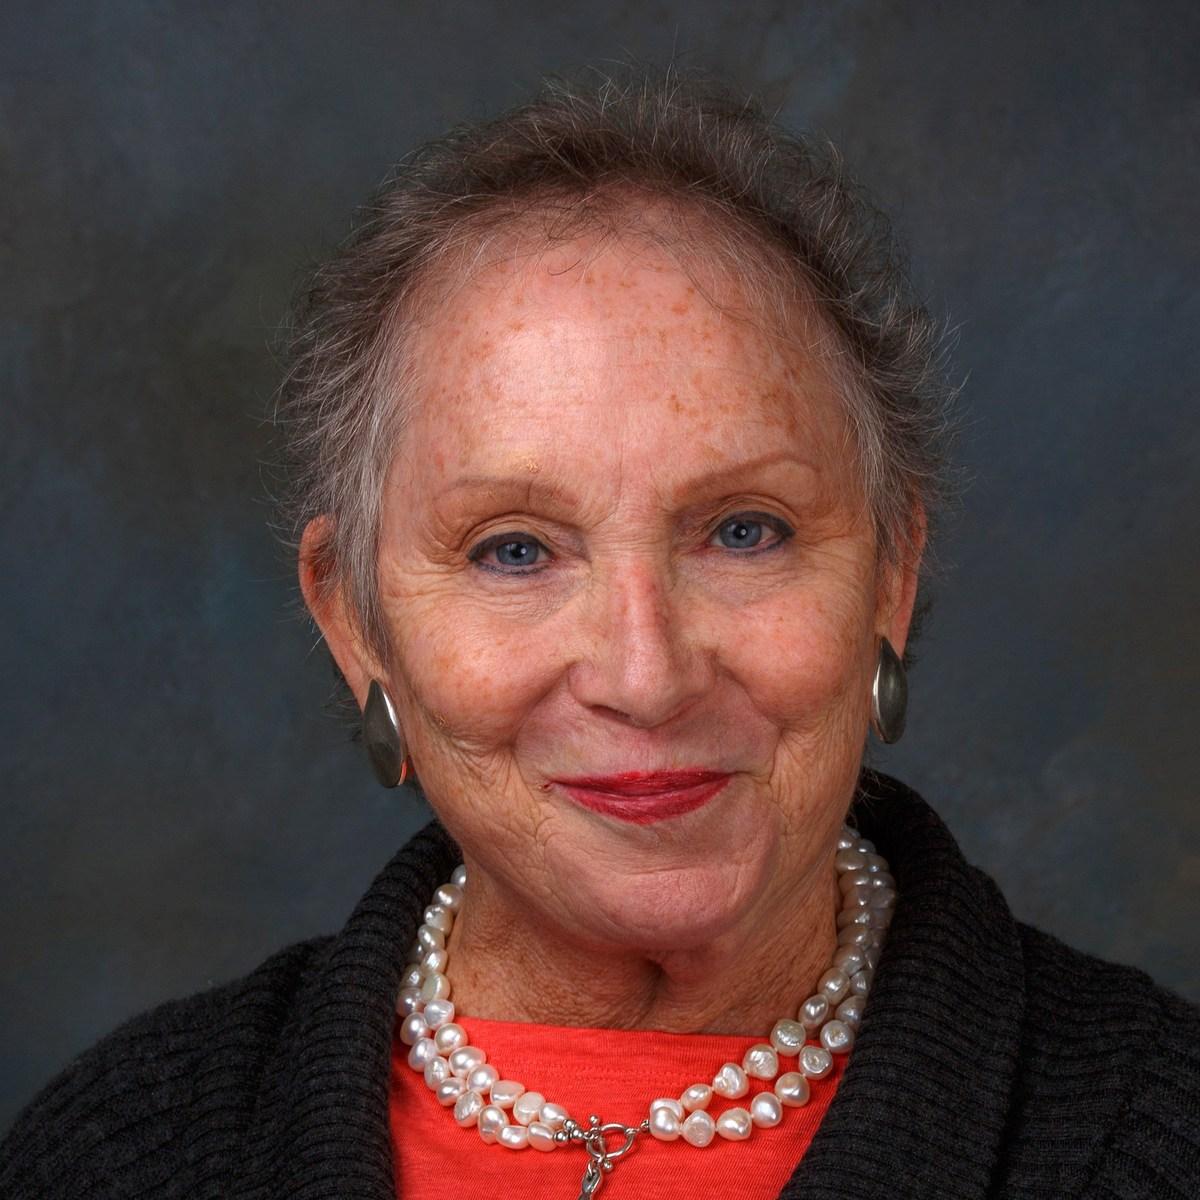 Sharon Kappelman-Culver's Profile Photo